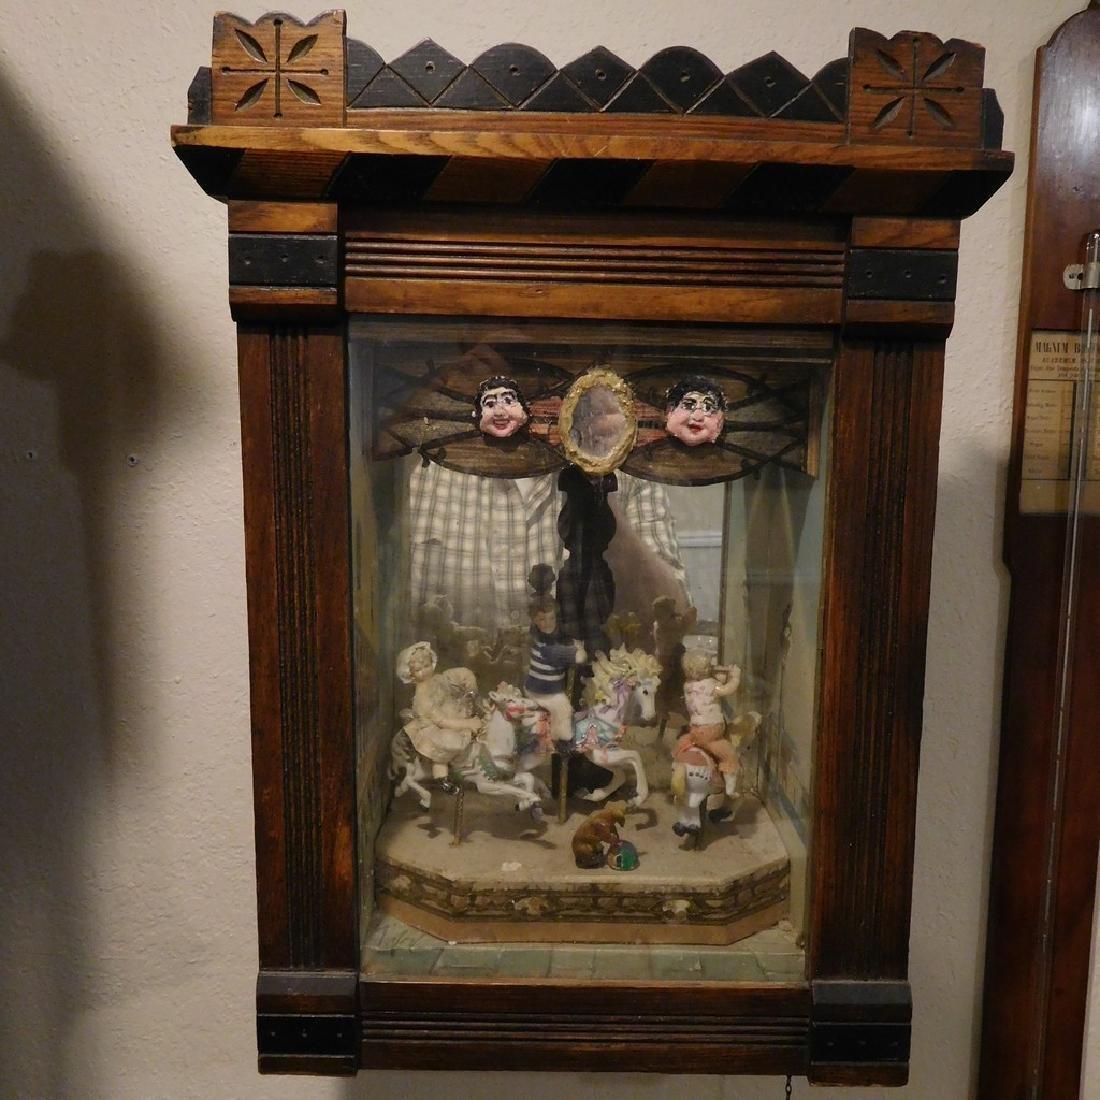 Very unusual Carousel music box